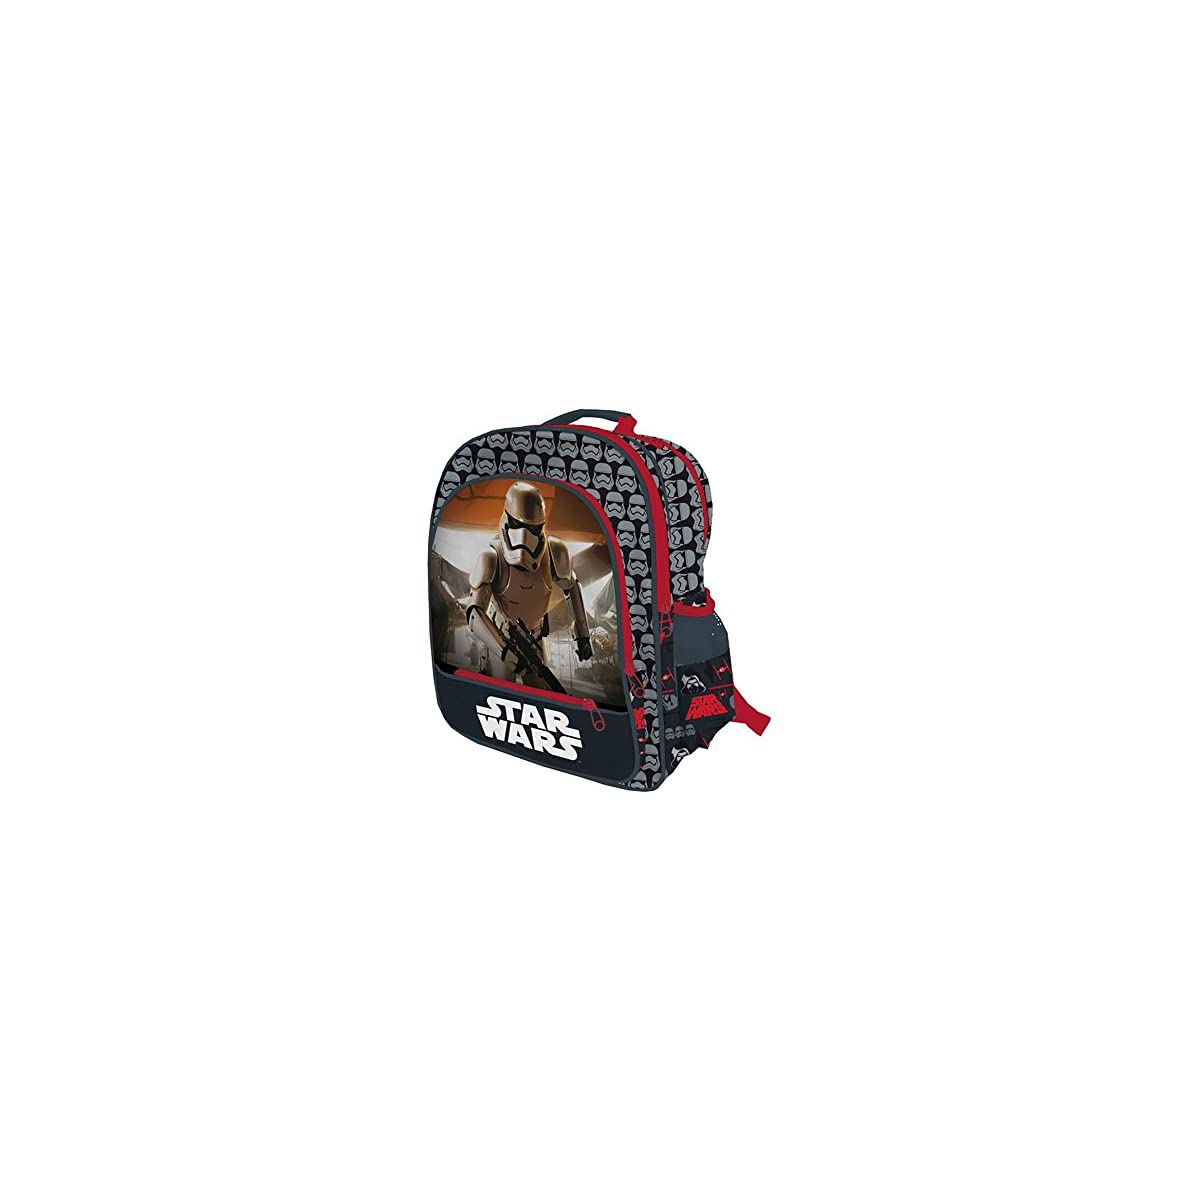 51BLsStdHQL. SS1200  - Star Wars 2018 Mochila Infantil, 44 cm, Negro